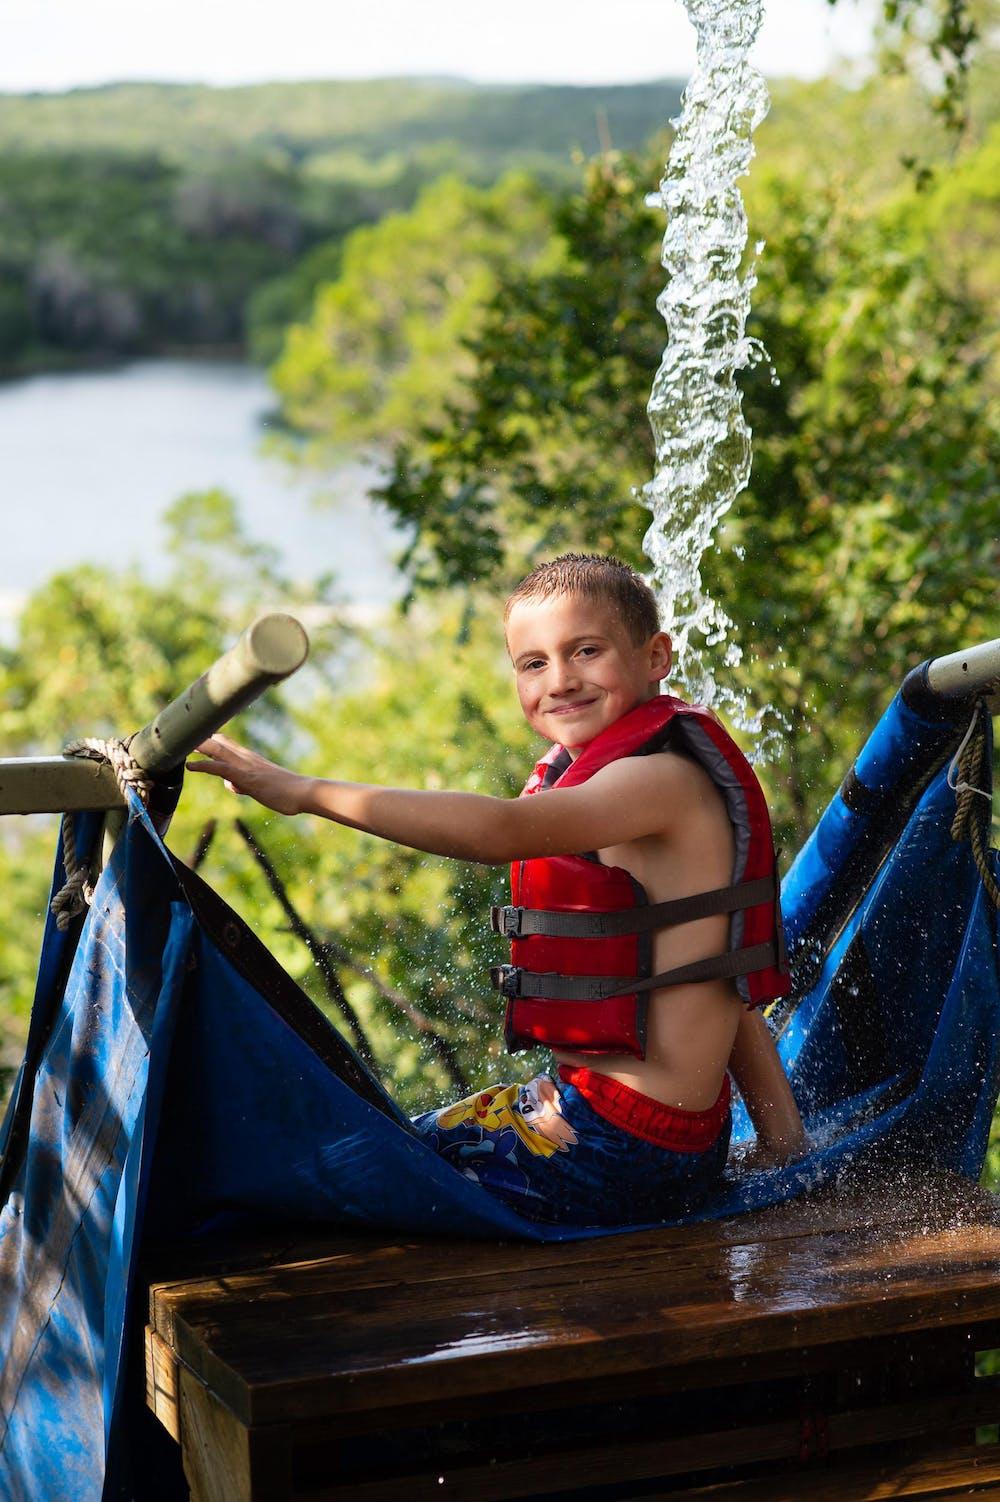 Smiling boy on the waterslide.jpg?ixlib=rails 2.1